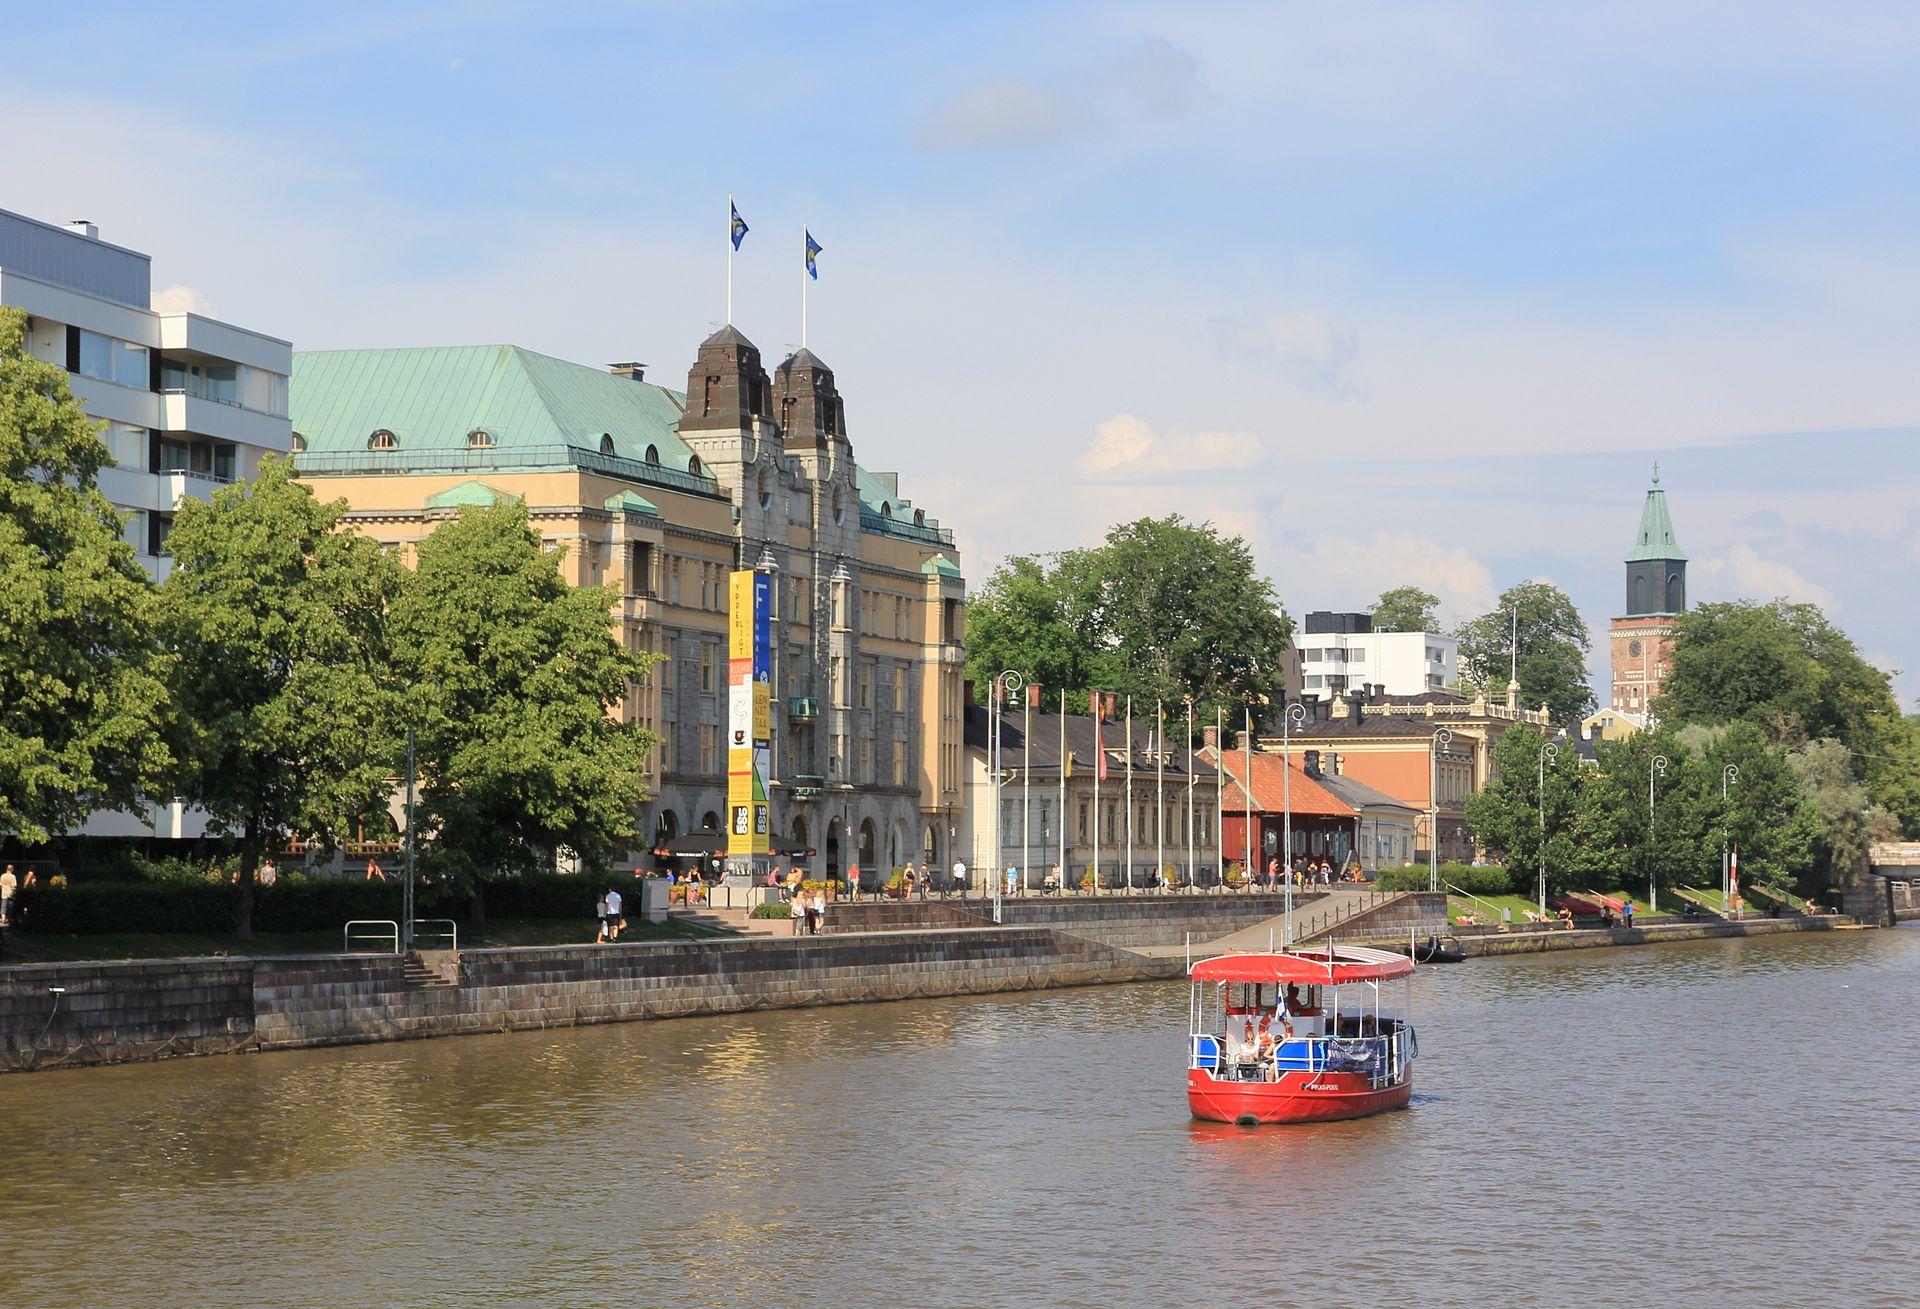 Shore of Aura river in Turku. Image:Wikimedia commons